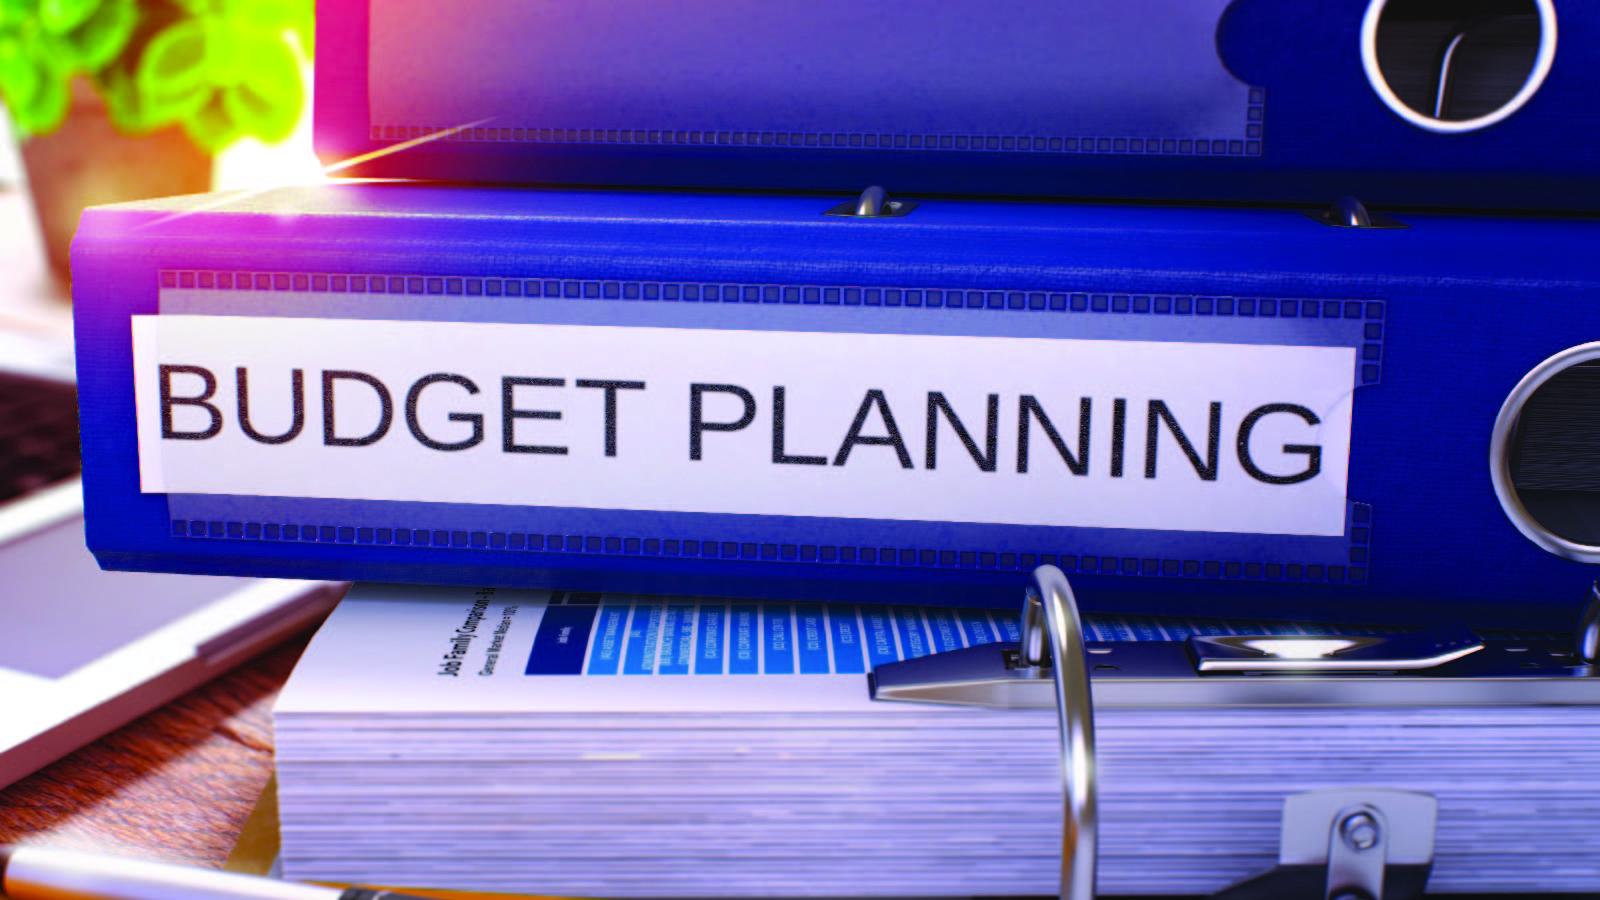 IT Budget, COVID-19, Serverless systems, Data Management, IT Infrastructure, IT Spending, ROI, Social Media, Website Management CEO, CIO, CFO, IT, IT Budget, COVID-19, Serverless systems, Data Management